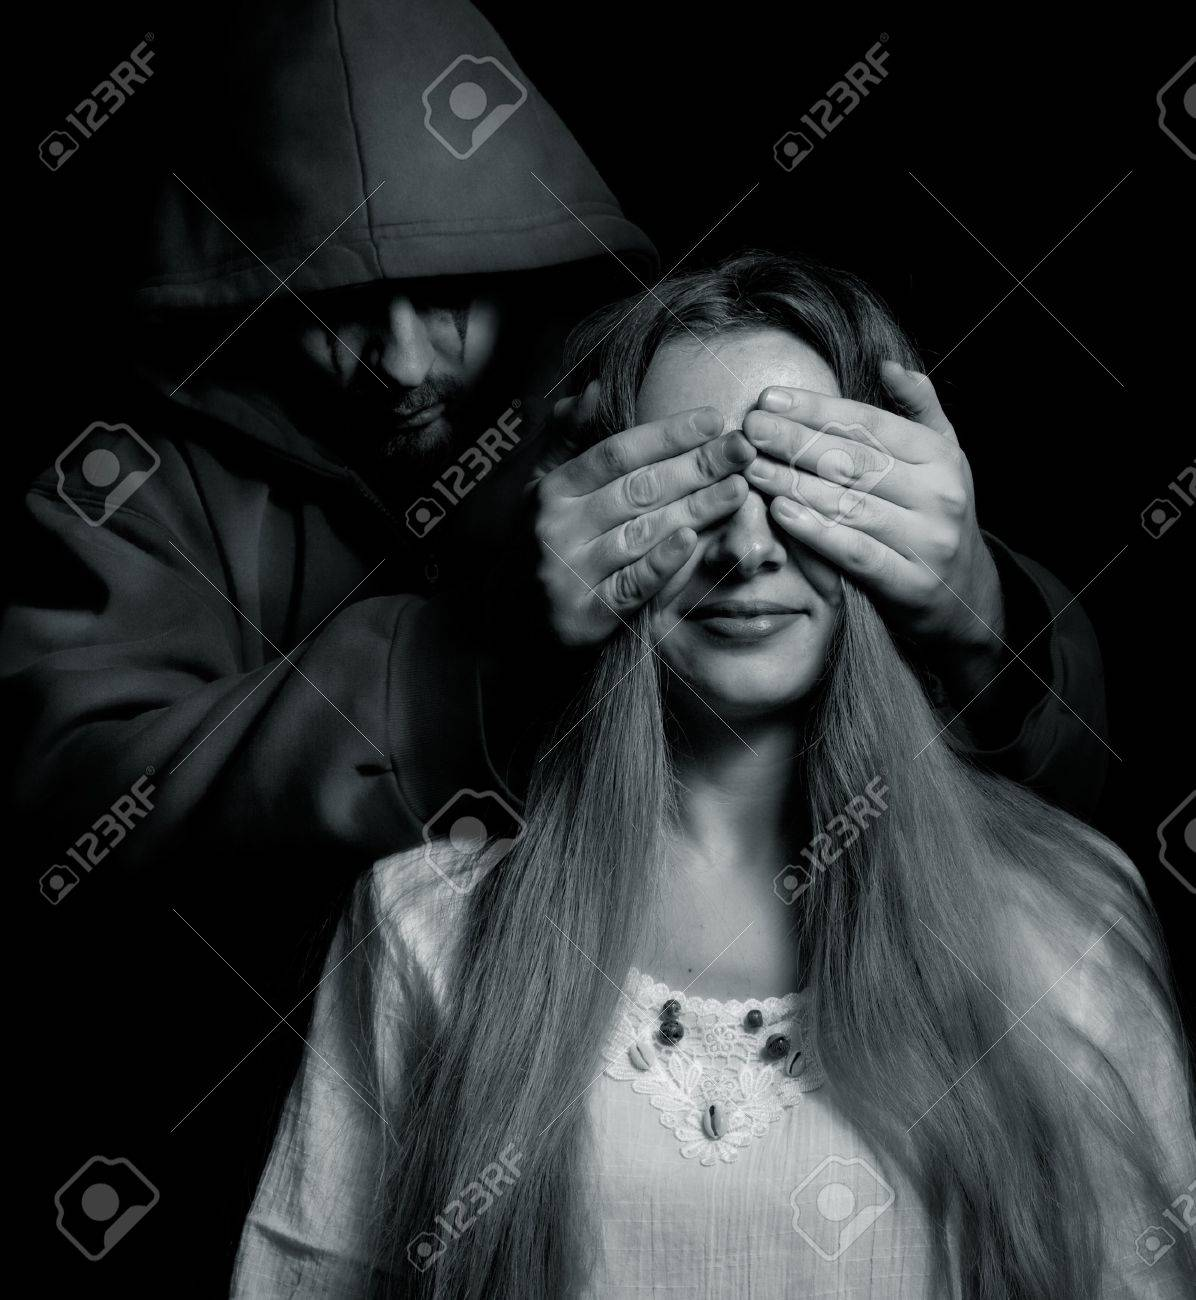 Halloween surprise - evil man behind innocent naive girl Stock Photo - 7820097